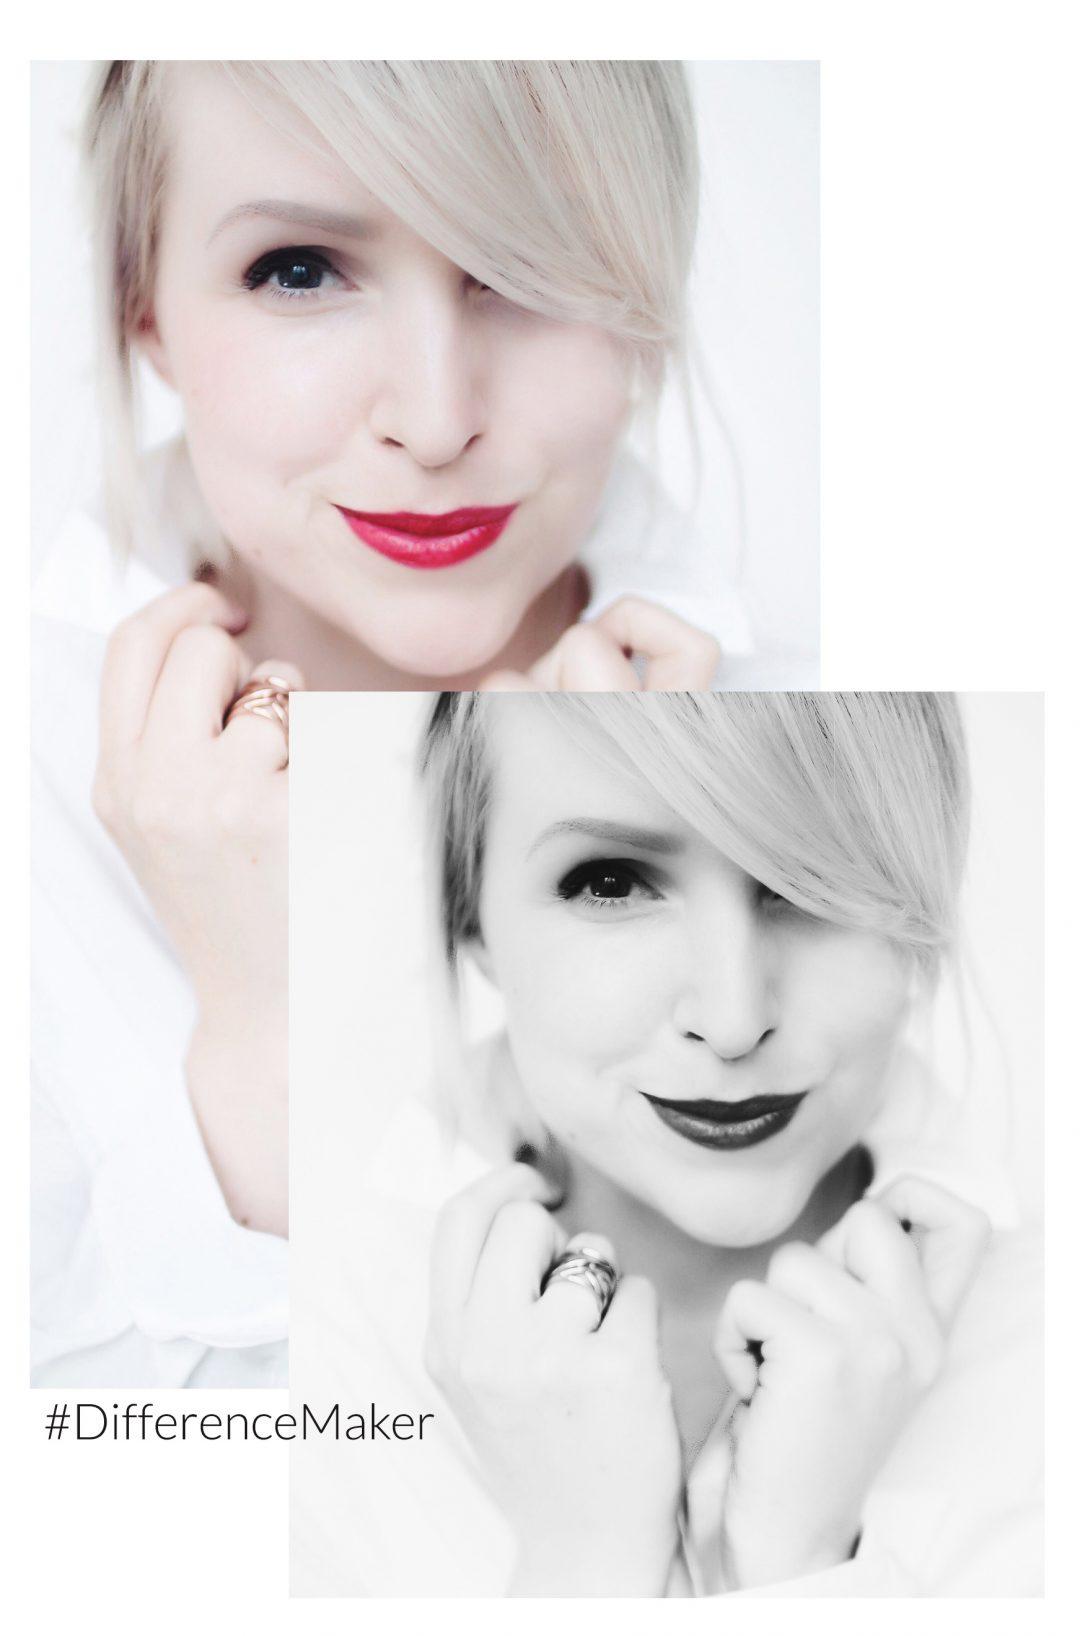 differencemaker_clinique_nazan_eckes_Beauty_emanzipation_zukkermaedchen